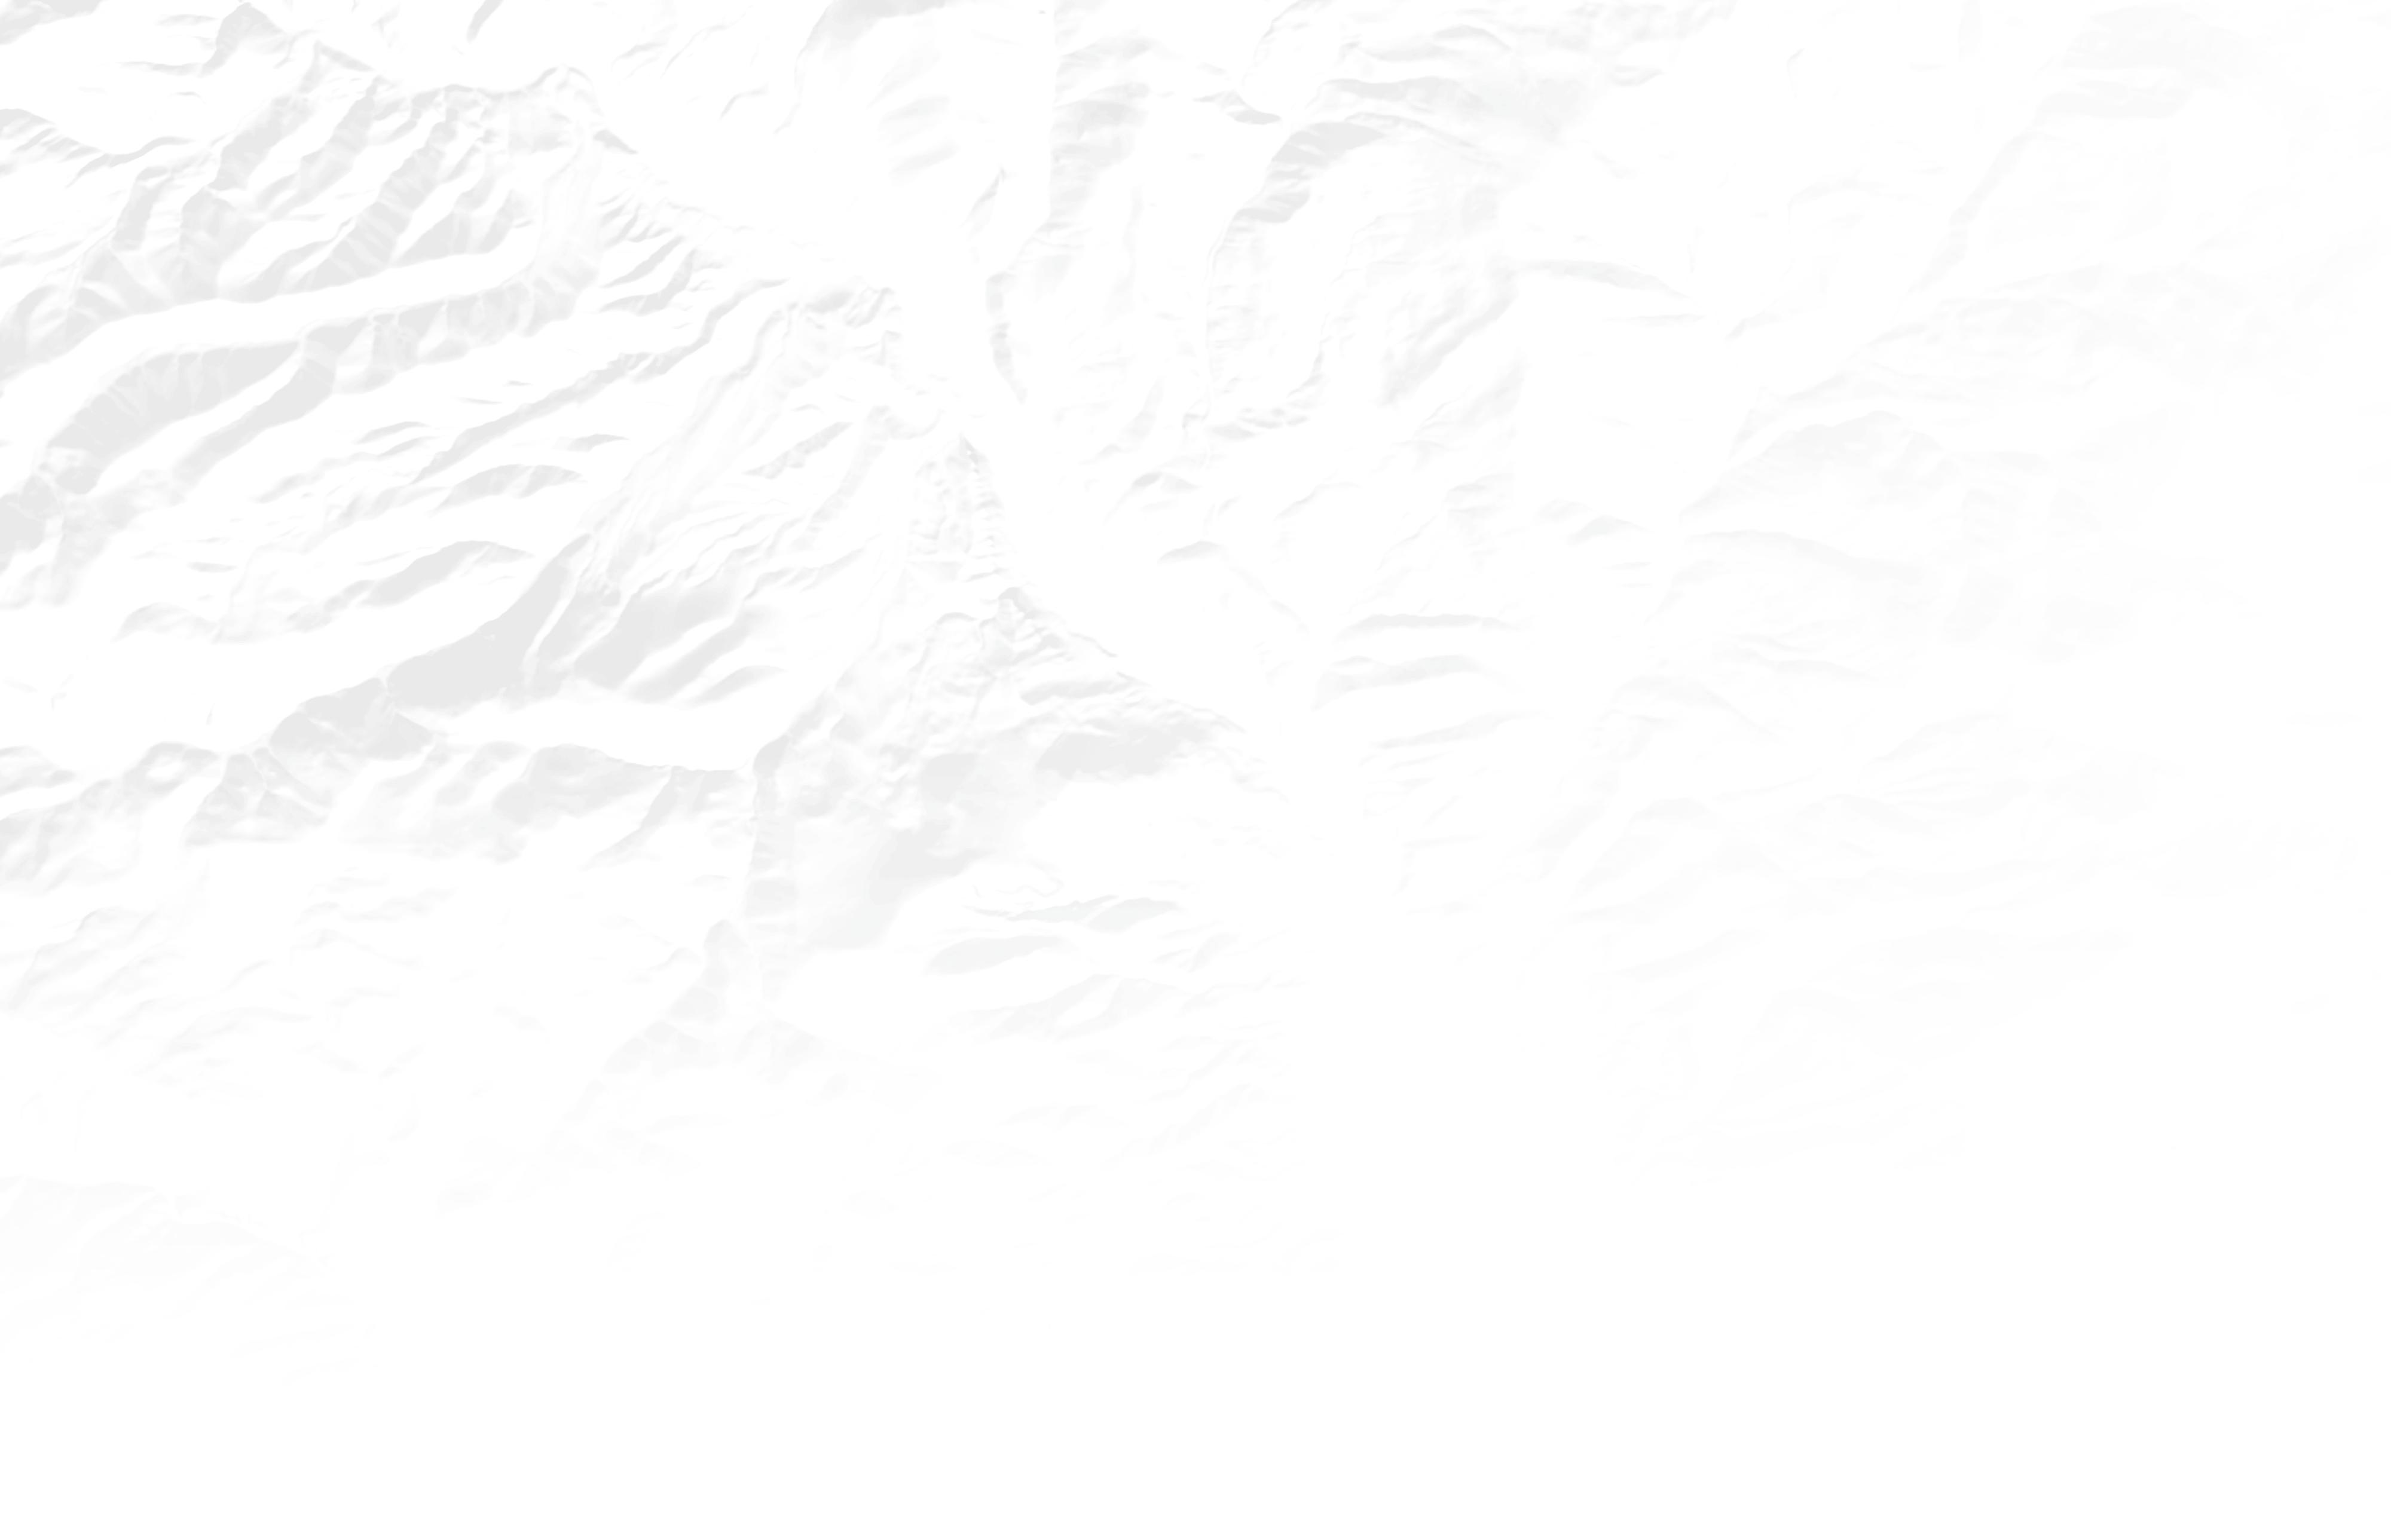 ShadedRelief_Background